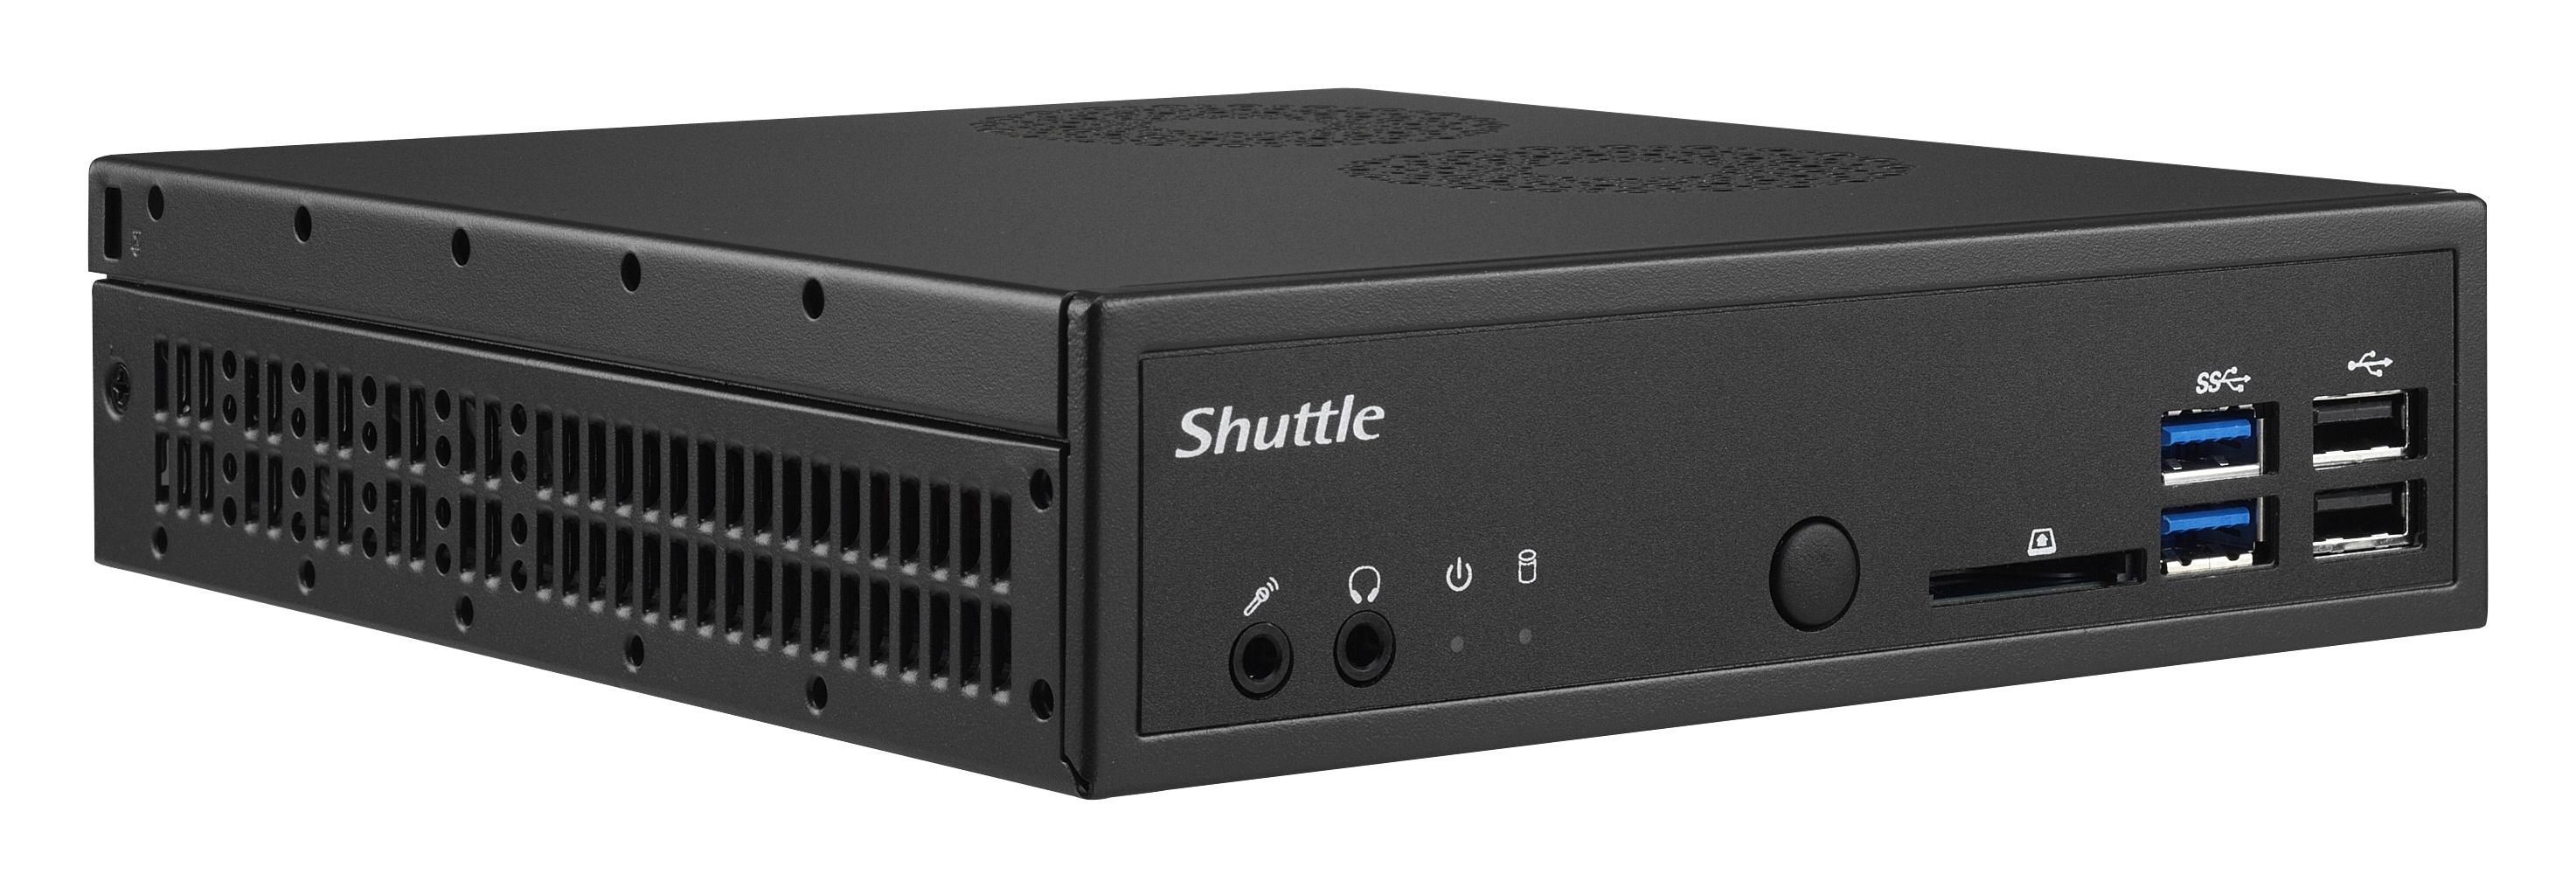 Shuttle DH110 Intel H110 LGA1151 1.3L sized PC Black barebone